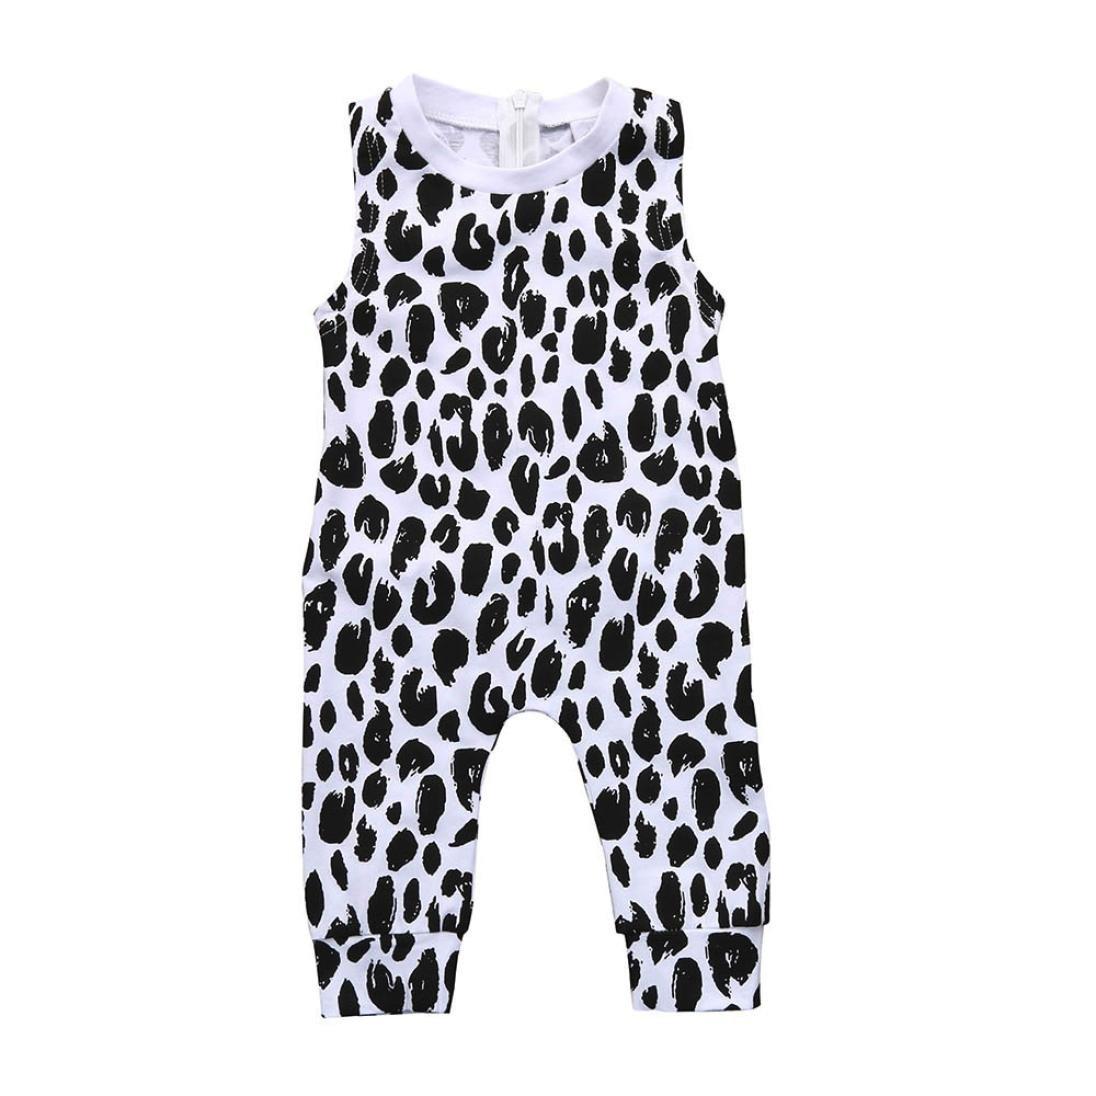 Zerototens Baby Jumpsuit, Toddler Infant Baby Boys Girls Sleepwear Onesie Bodysuit Sleeveless Onepiece Zipper Jumpsuit Clothes Leopard Romper Jumpsuit Trousers Summer Clothes